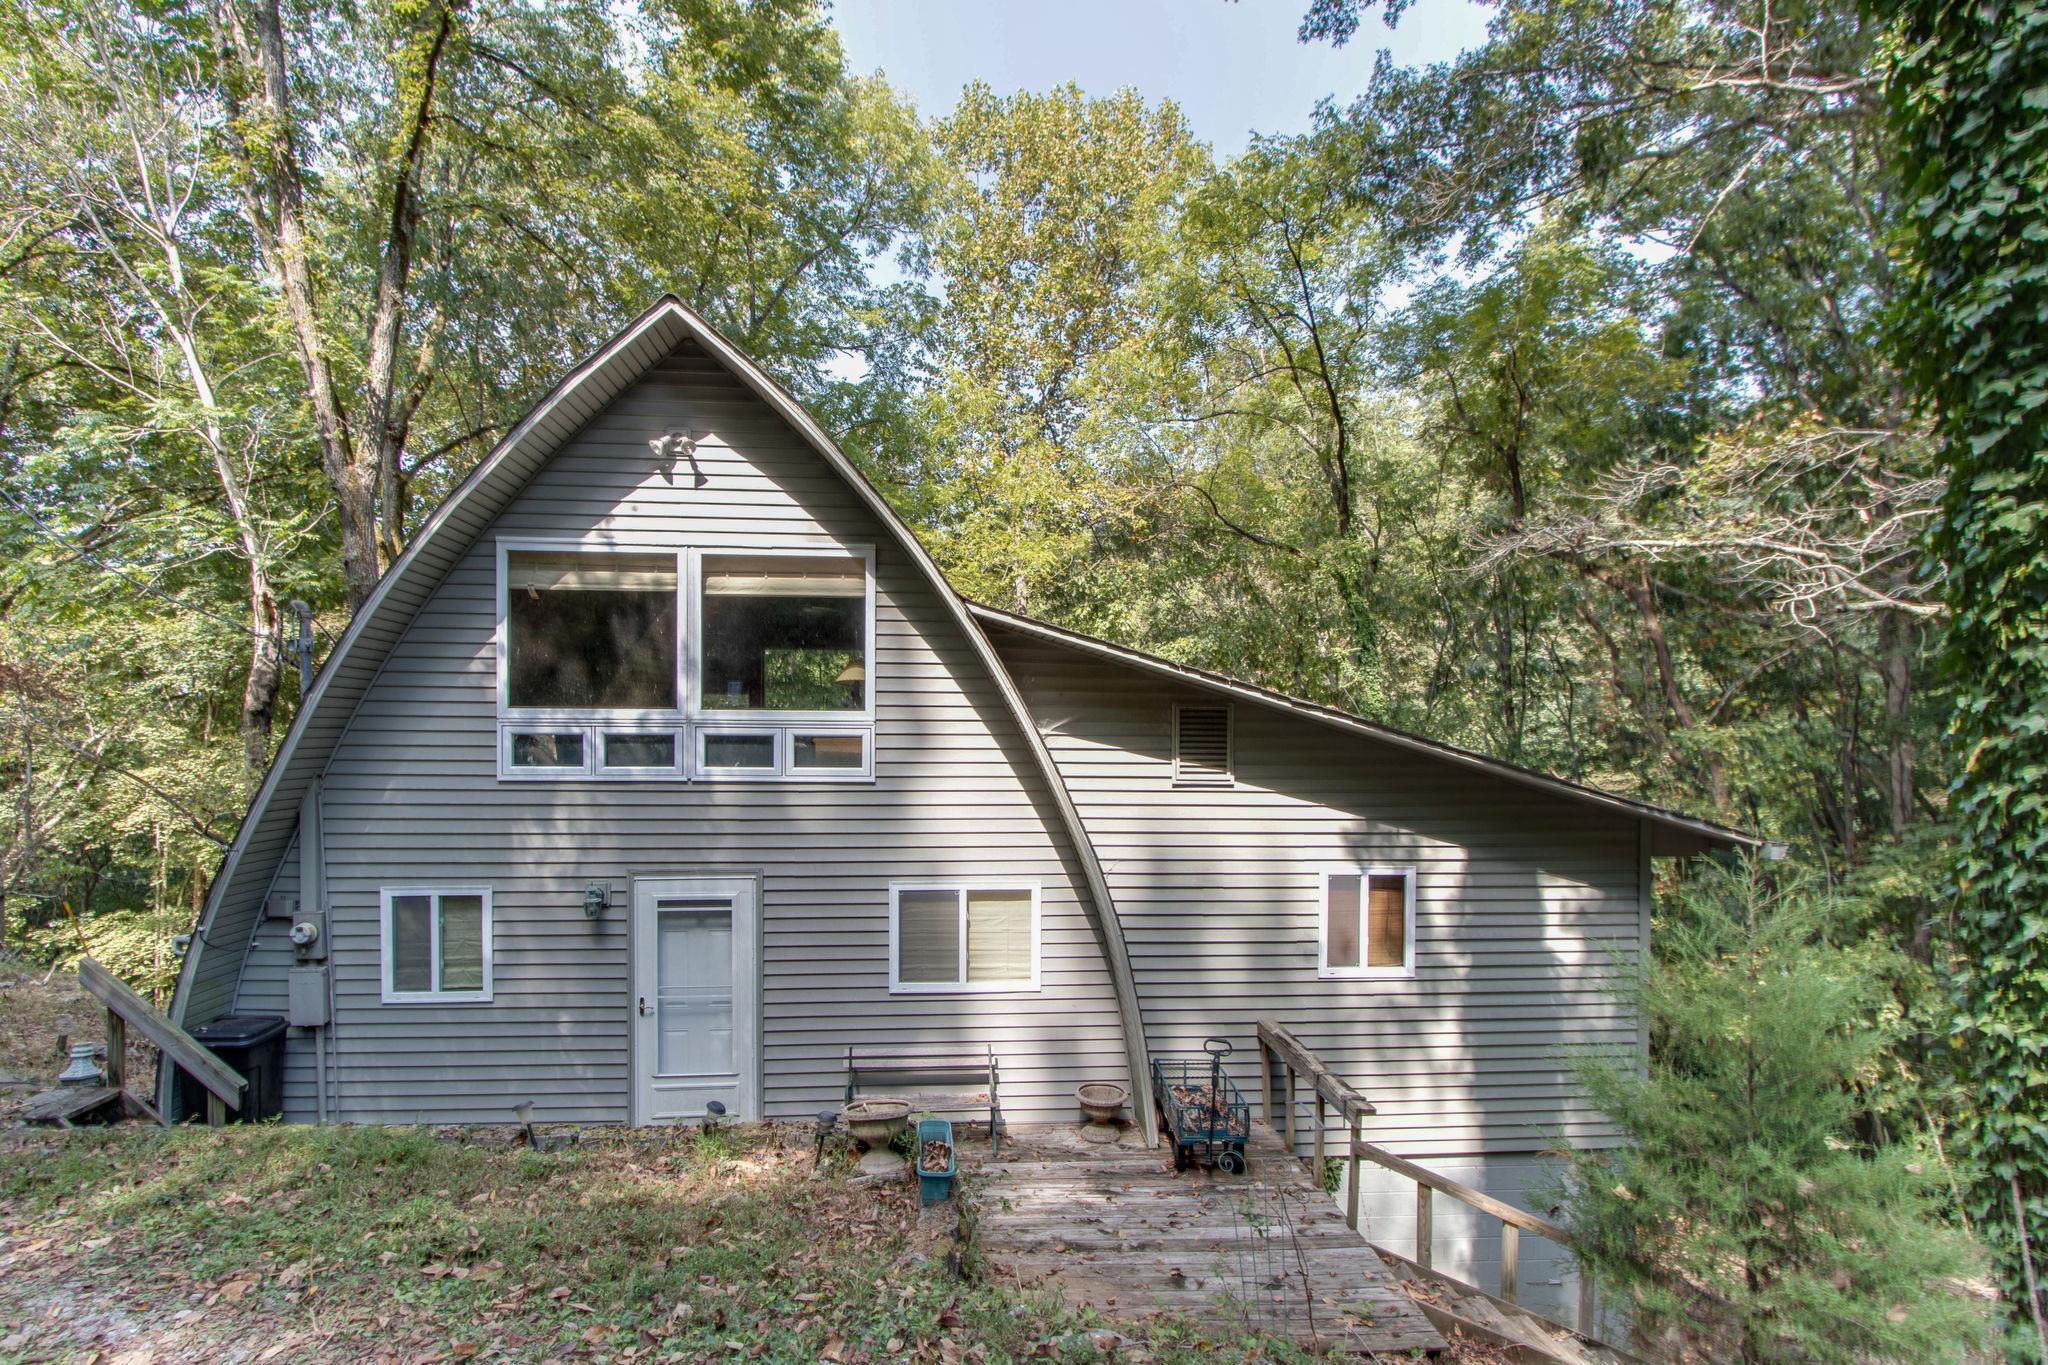 699 Hurricane Ln, Silver Point, TN 38582 - Silver Point, TN real estate listing